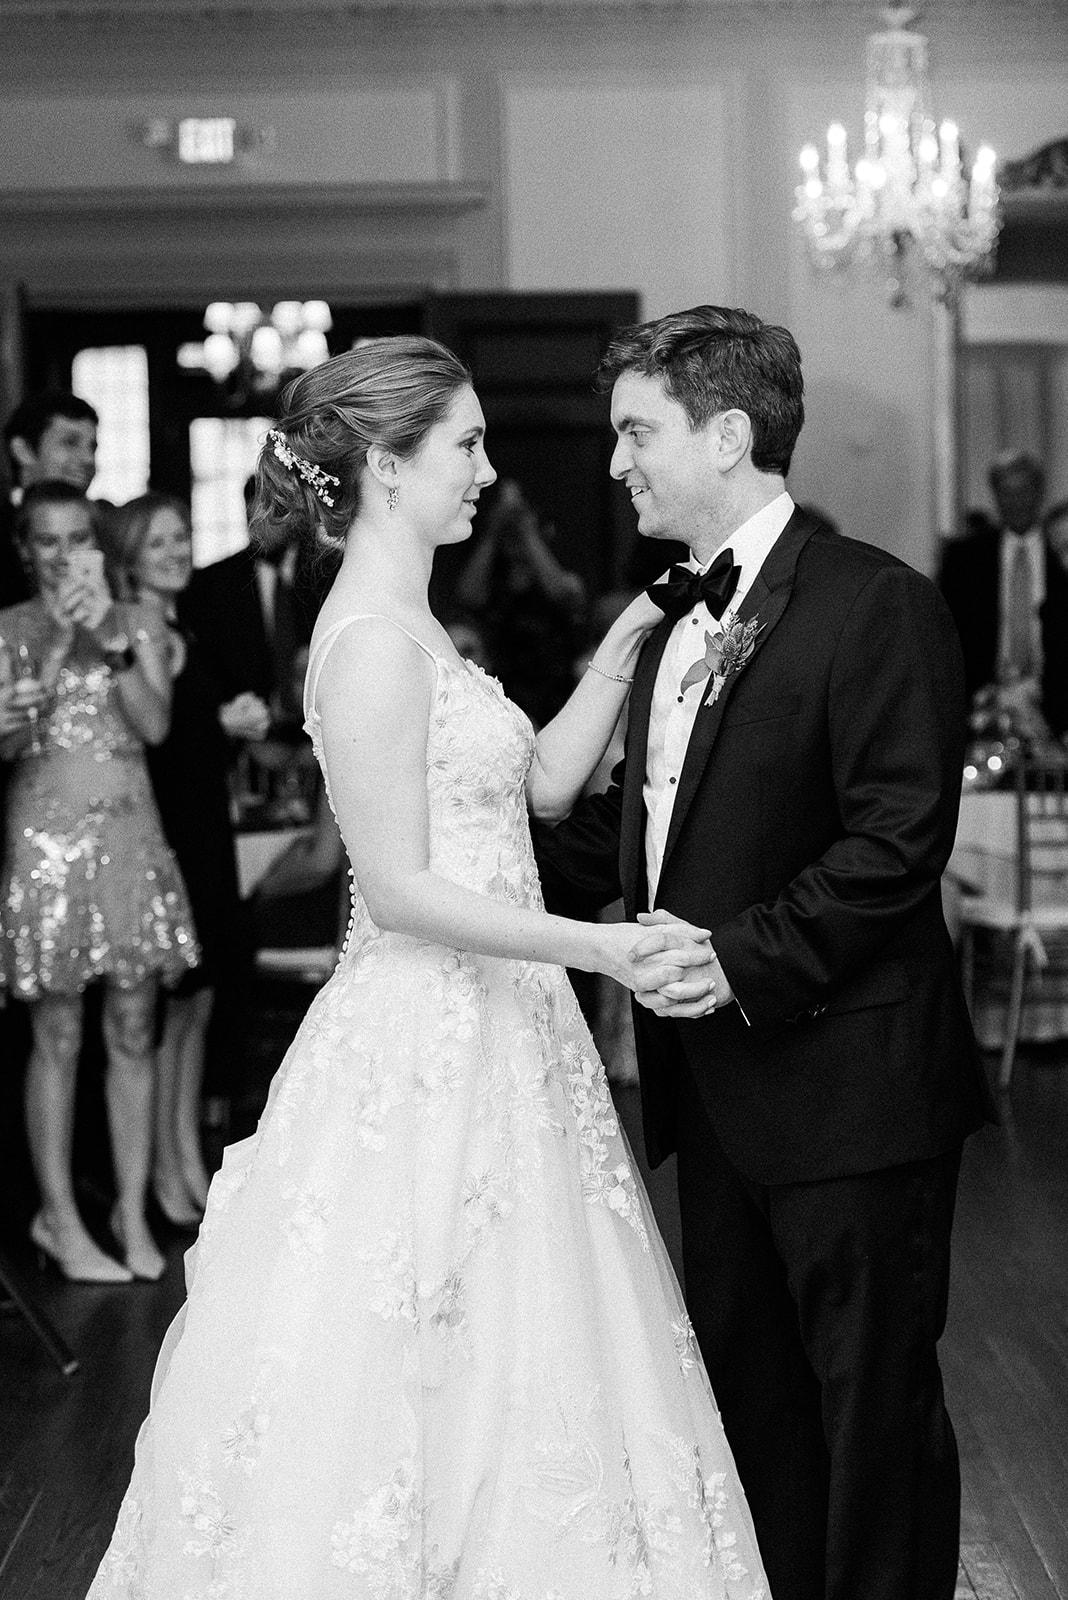 Lloyd+Wedding+by+Michelle+Lange+Photography-841.jpg